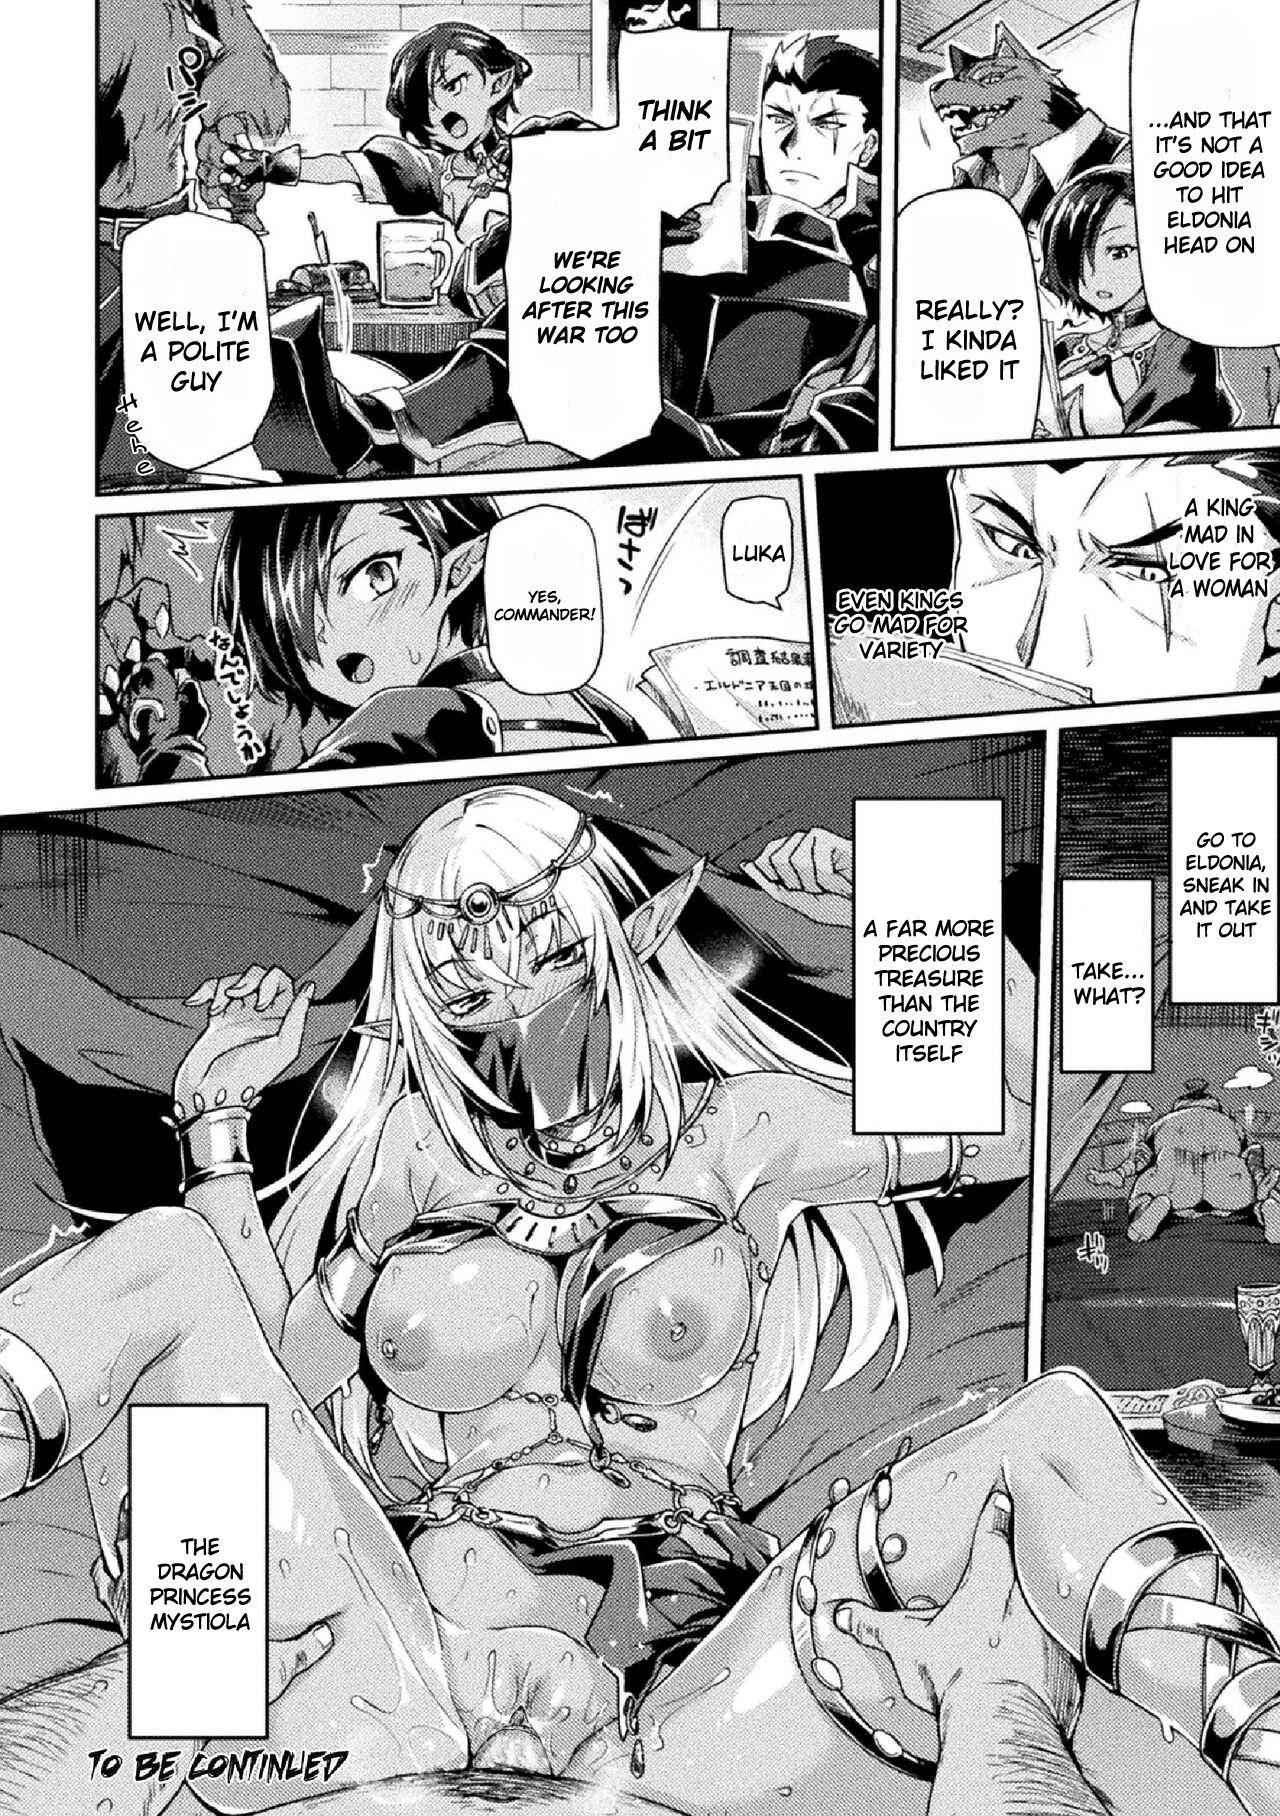 [Tsukitokage] Kuroinu II ~Inyoku ni Somaru Haitoku no Miyako, Futatabi~ THE COMIC Ch. 5 (Kukkoro Heroines Vol. 5) [English] [Klub Kemoner] [Decensored] [Digital] 19